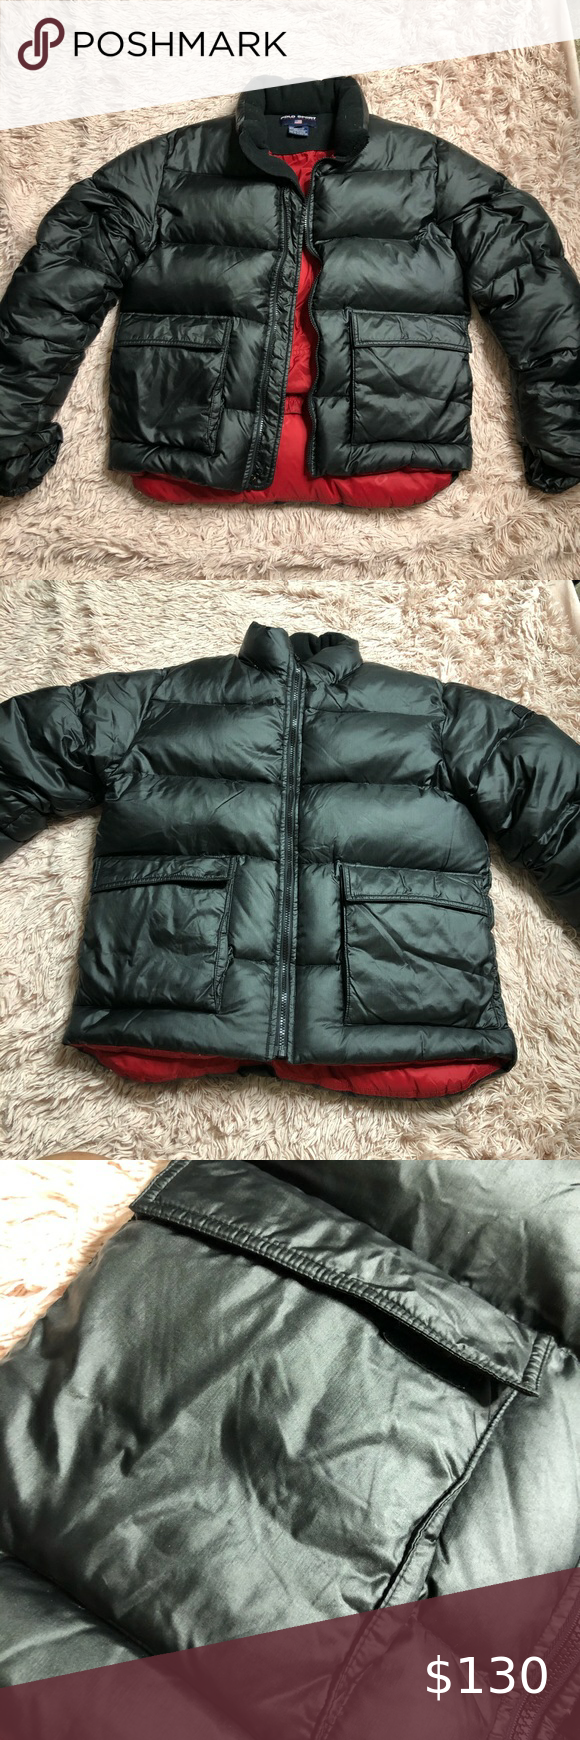 Polo Sport By Ralph Lauren Black Puffer Coat Black Puffer Coat Black Puffer Puffer Coat [ 1740 x 580 Pixel ]